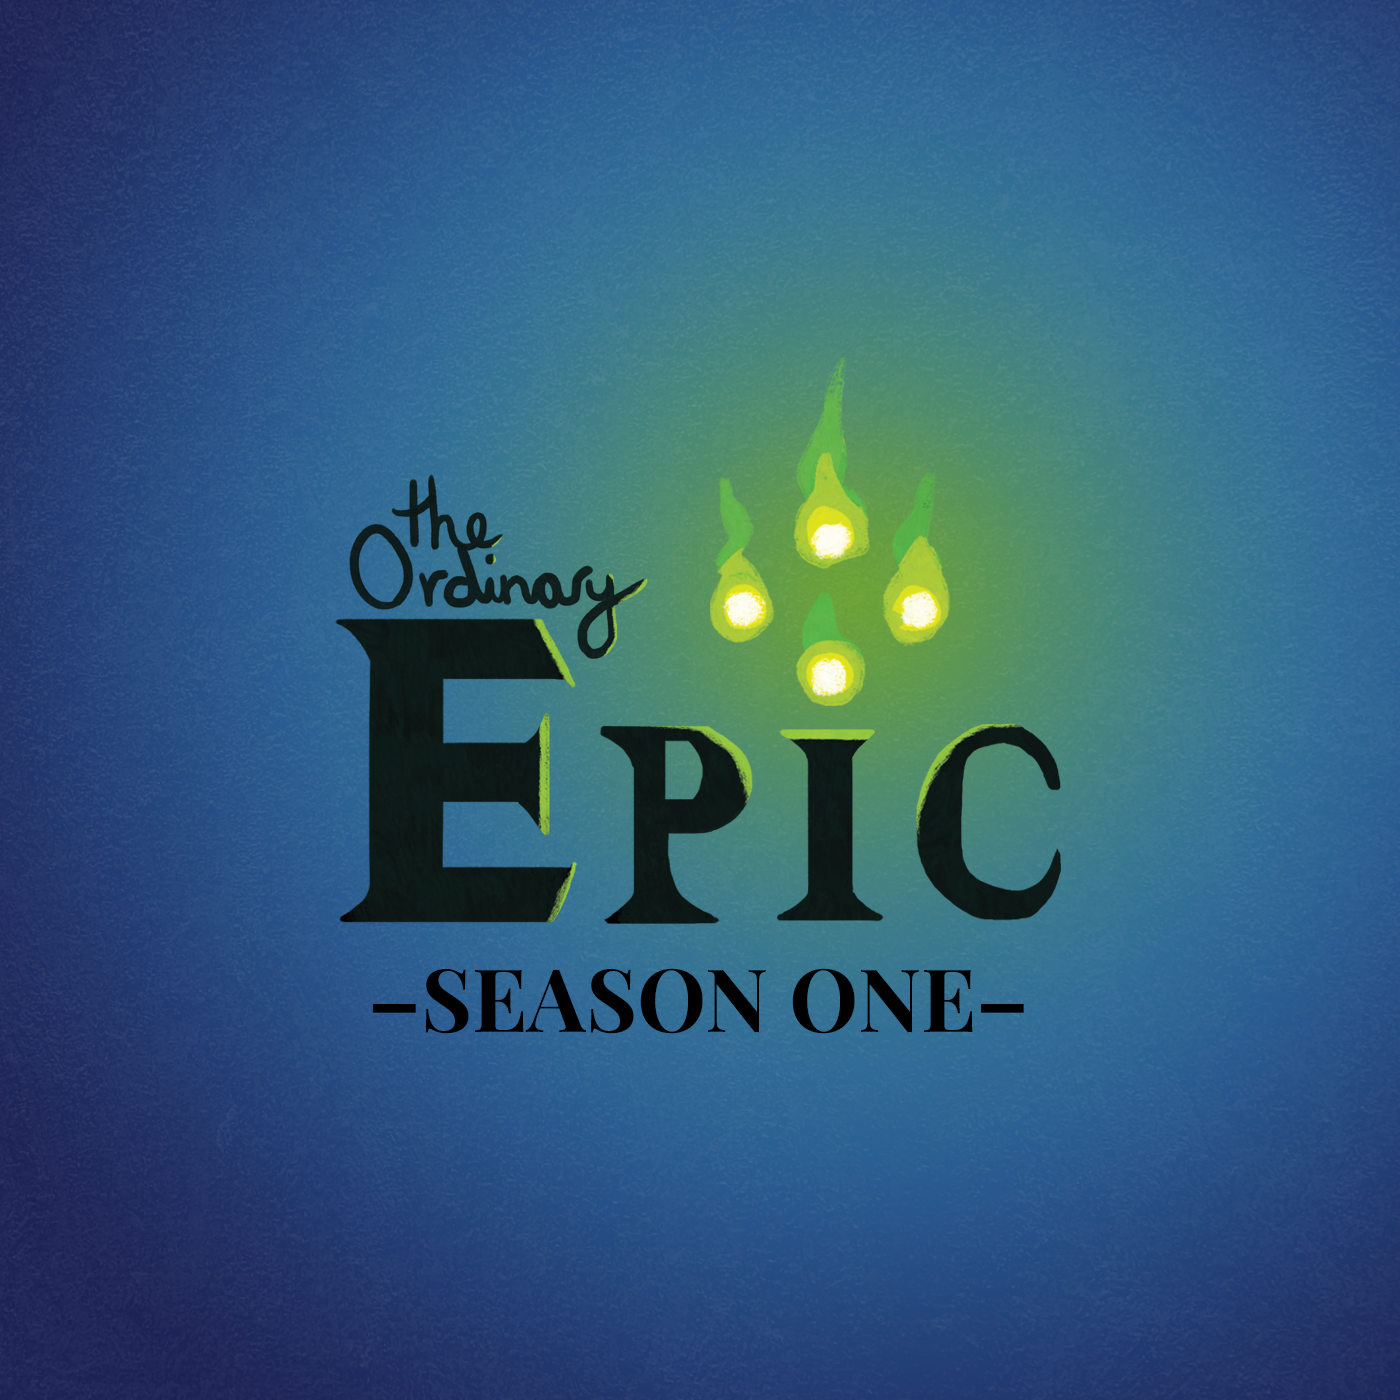 The-Ordinary-Epic-season-one-logo - Brandon Crose.png